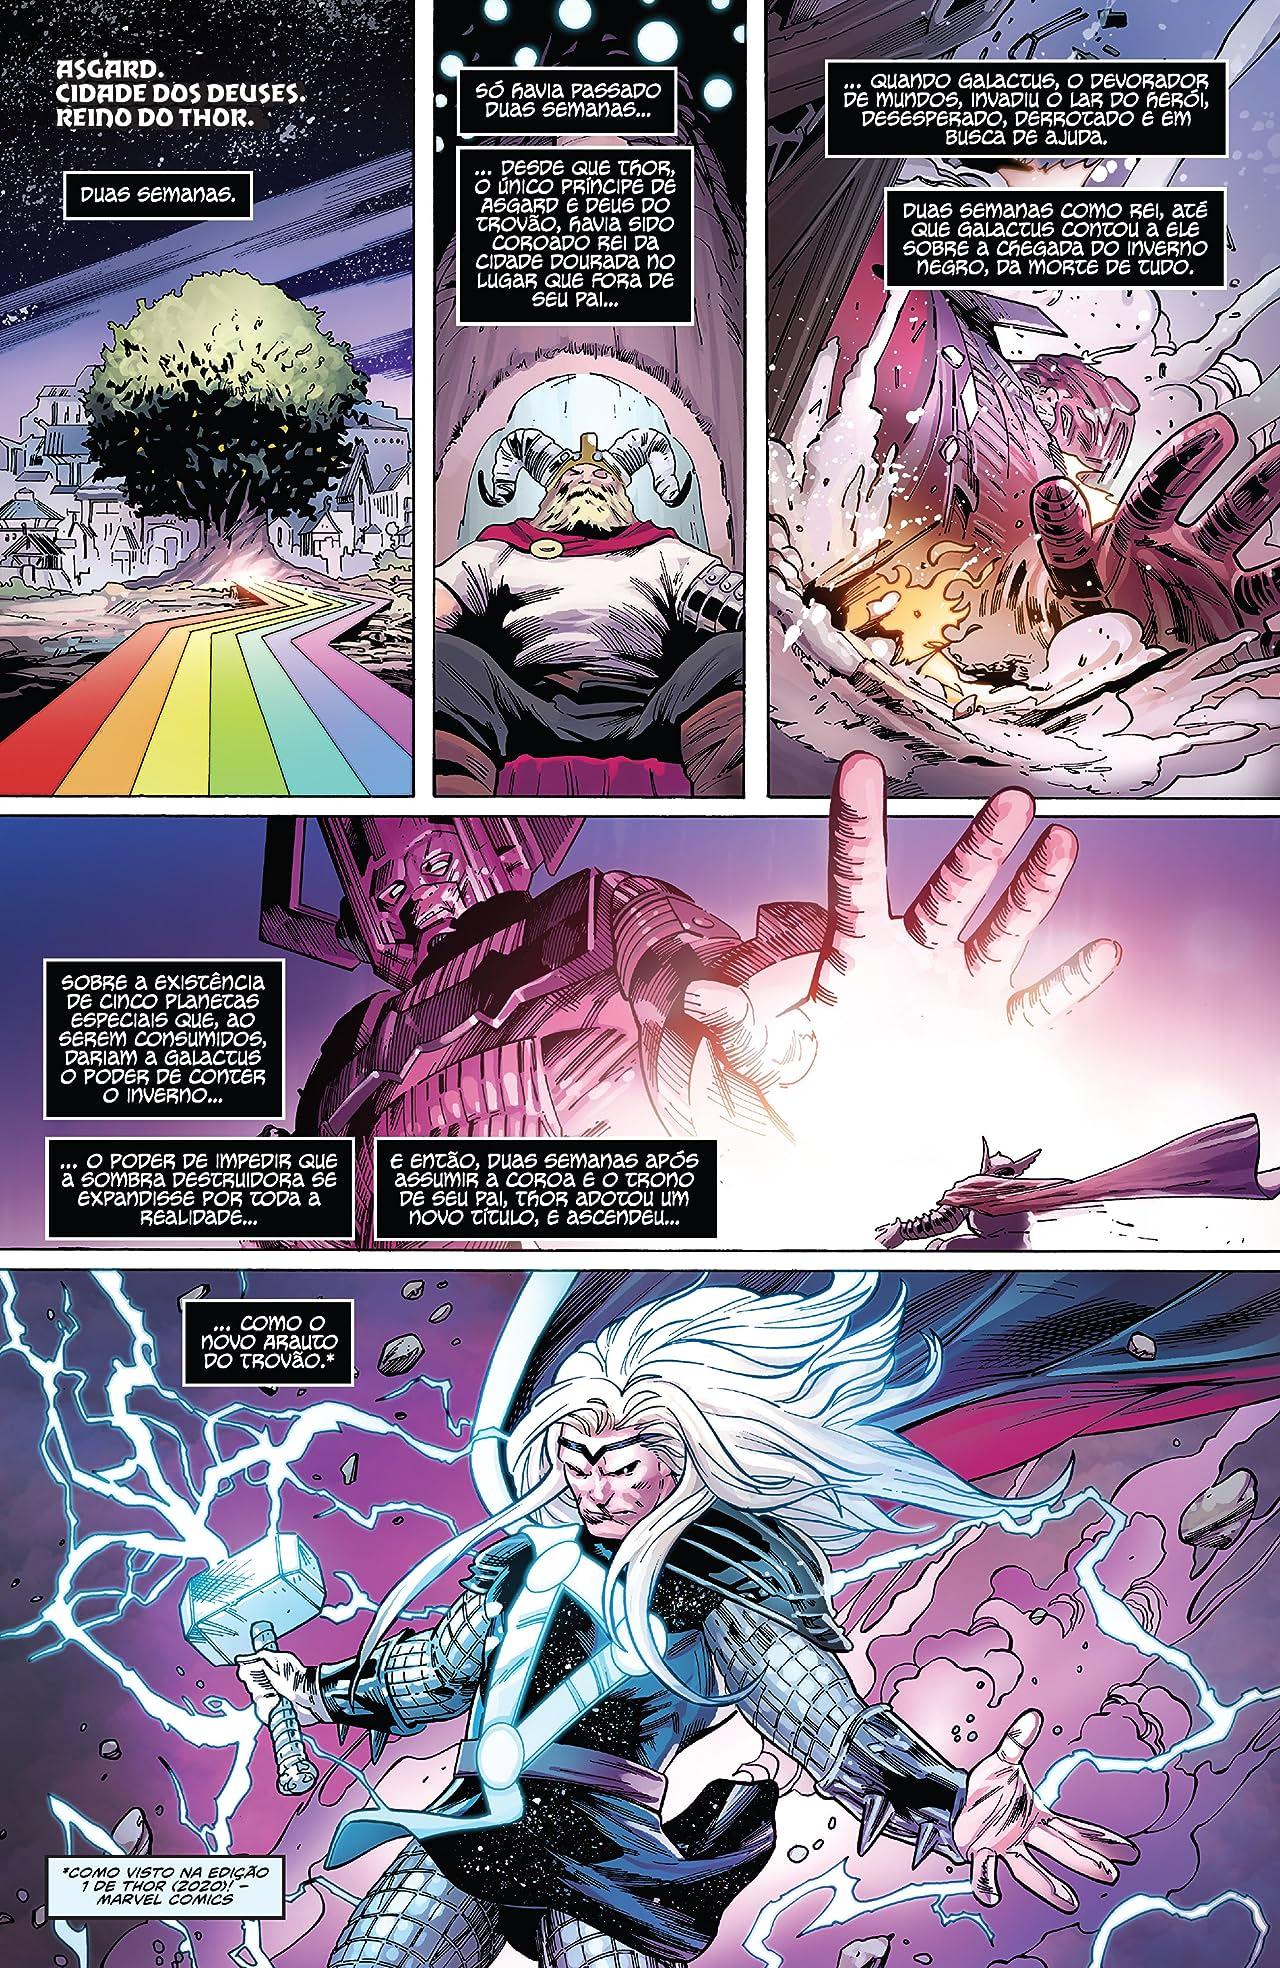 Fortnite x Marvel - Nexus War: Thor (Brazilian Portuguese) #1